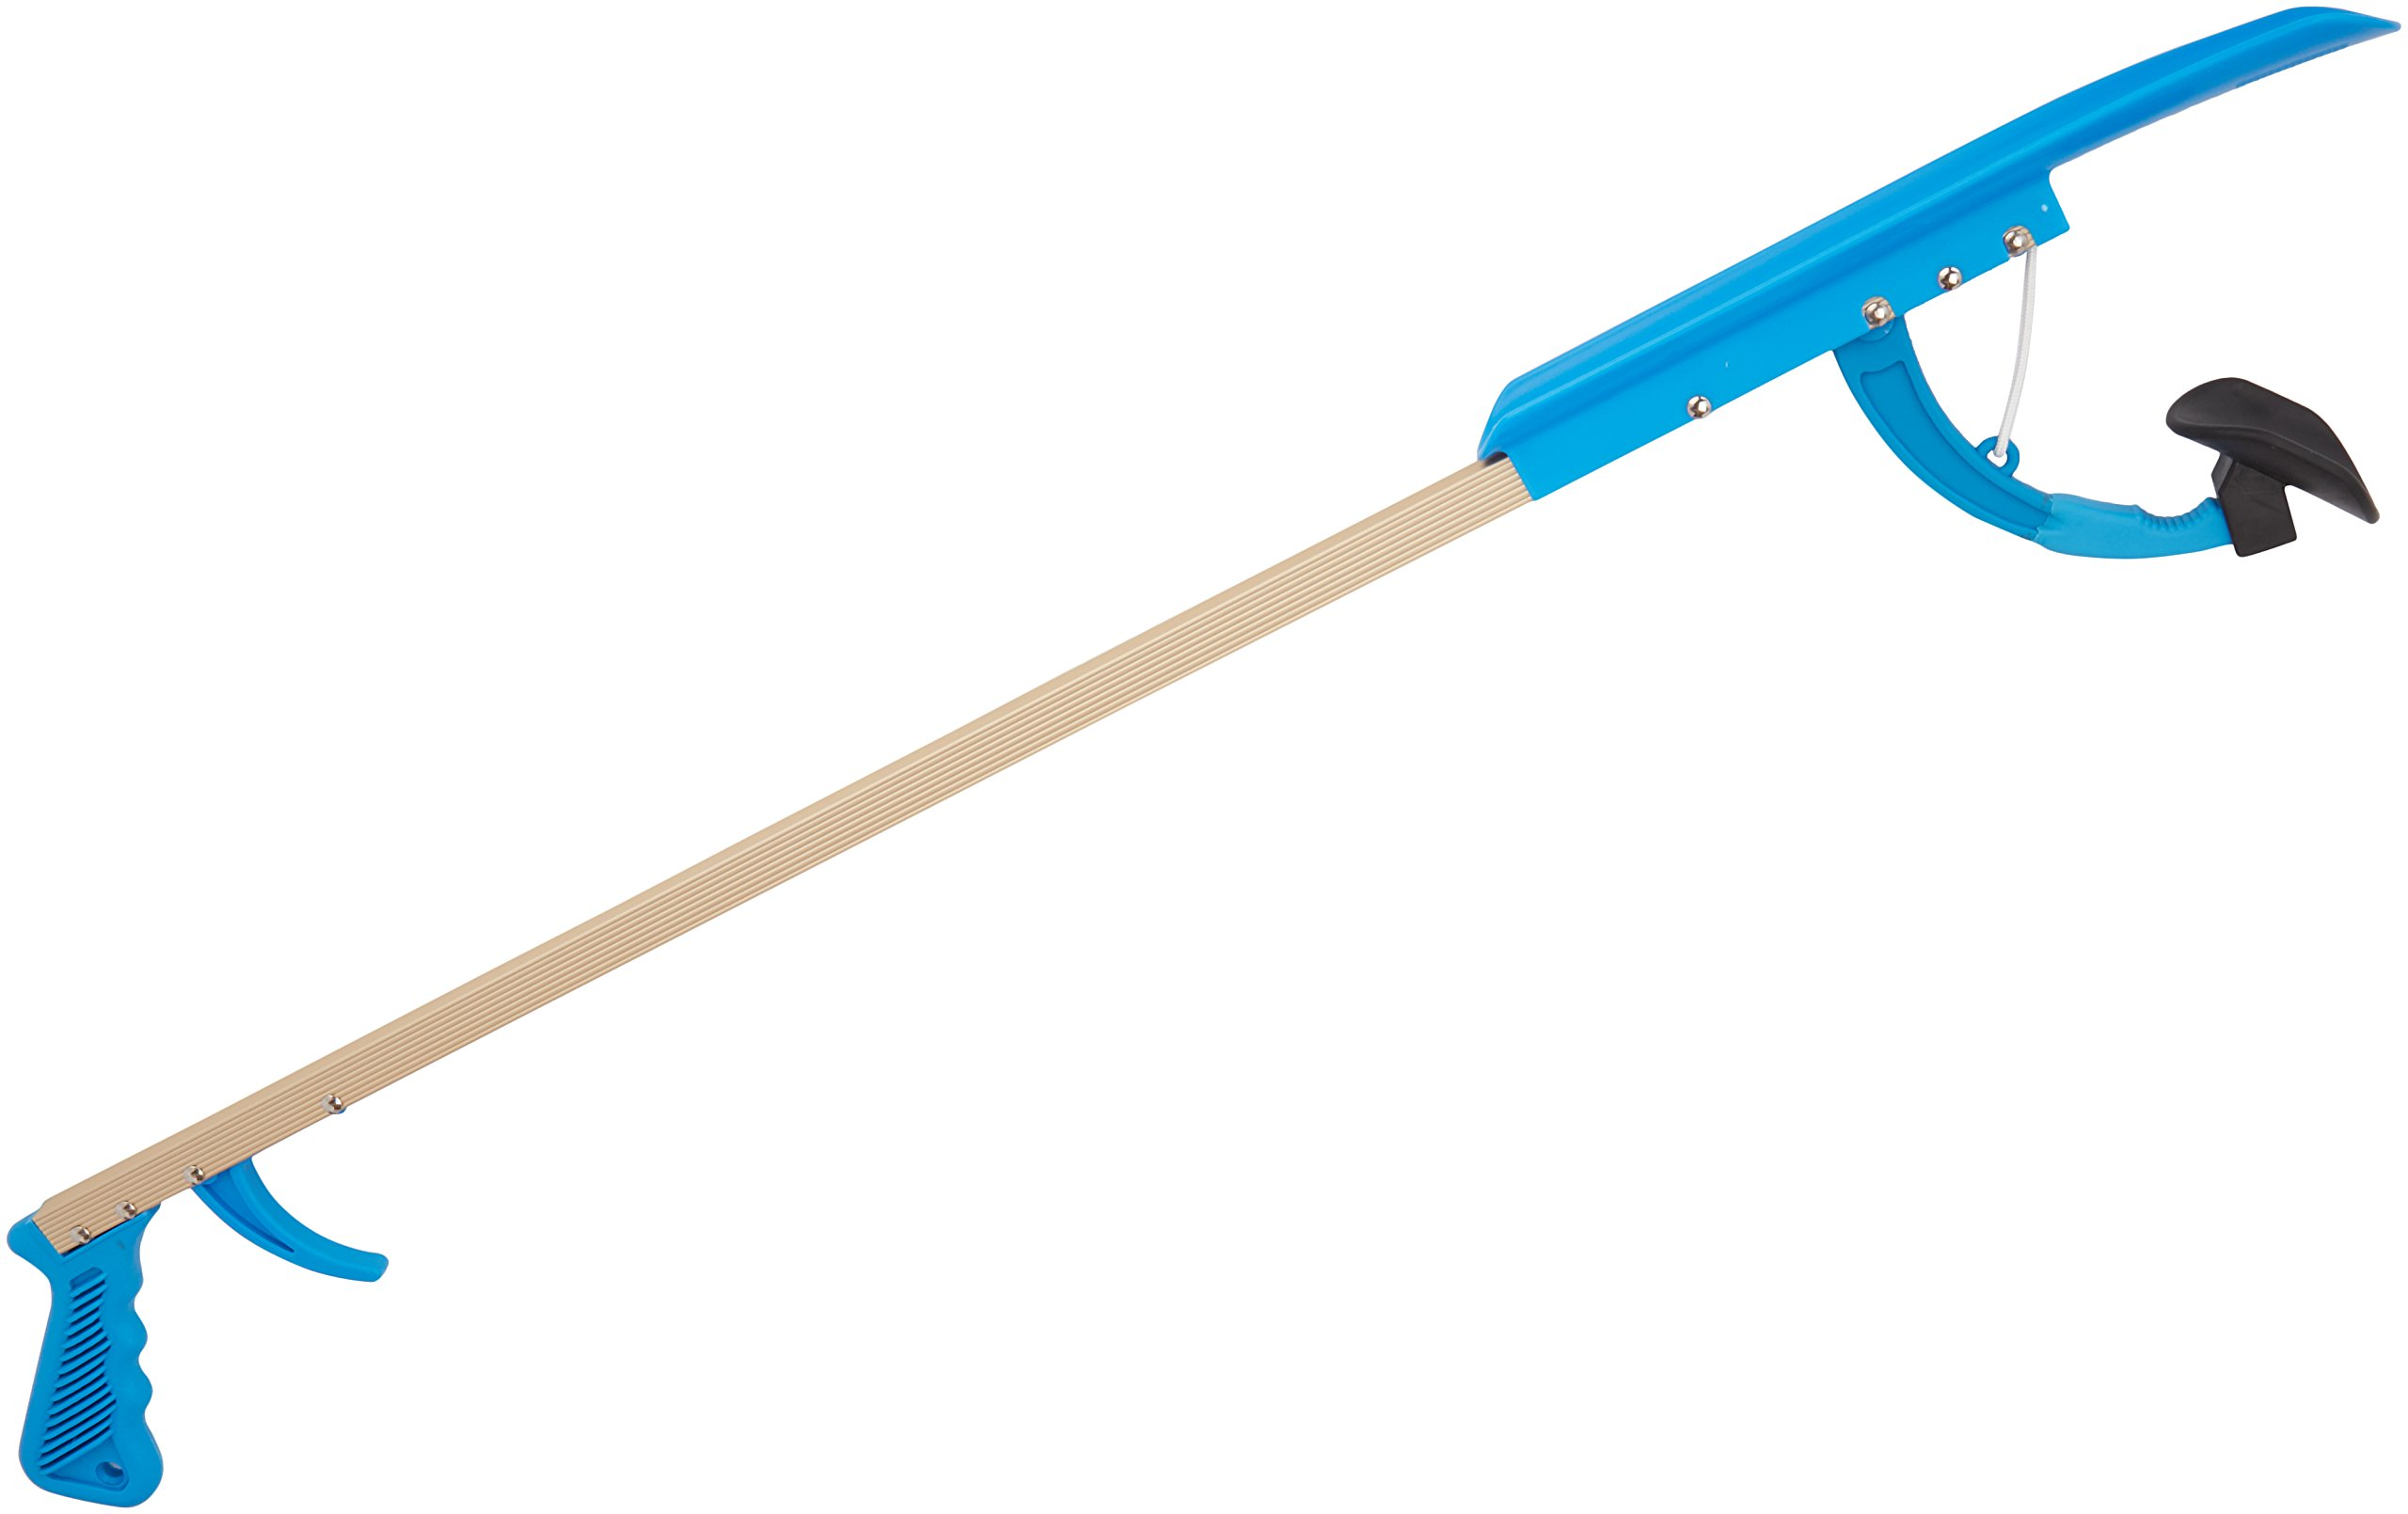 Sammons Preston 32'' Shoe Horn Reacher, Lightweight Extended Reacher Grabber for Picking Up Objects, Reaching & Grabbing Tool for Elderly & Limited Mobility, Shoehorn for Putting on Shoes